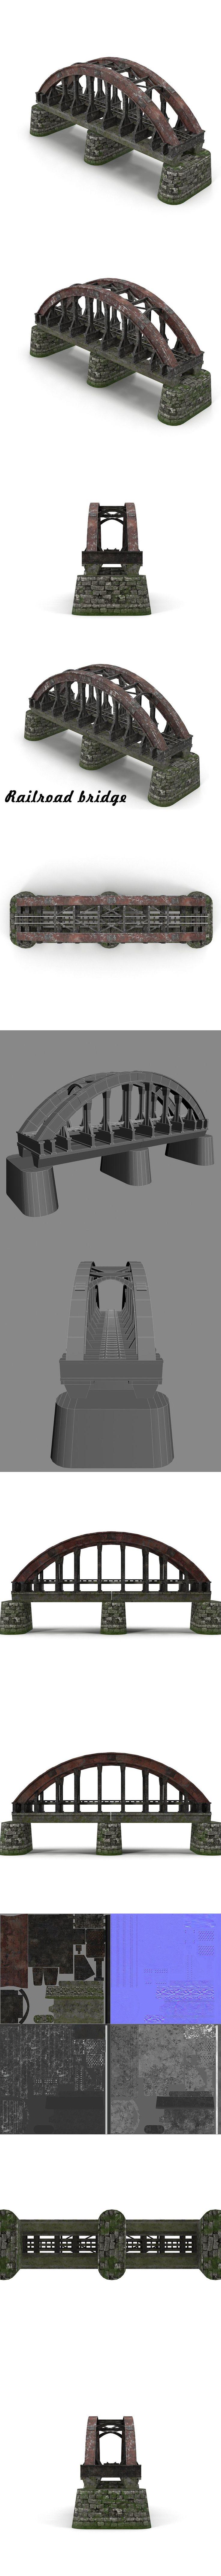 Railroad bridge #railroad #bridge